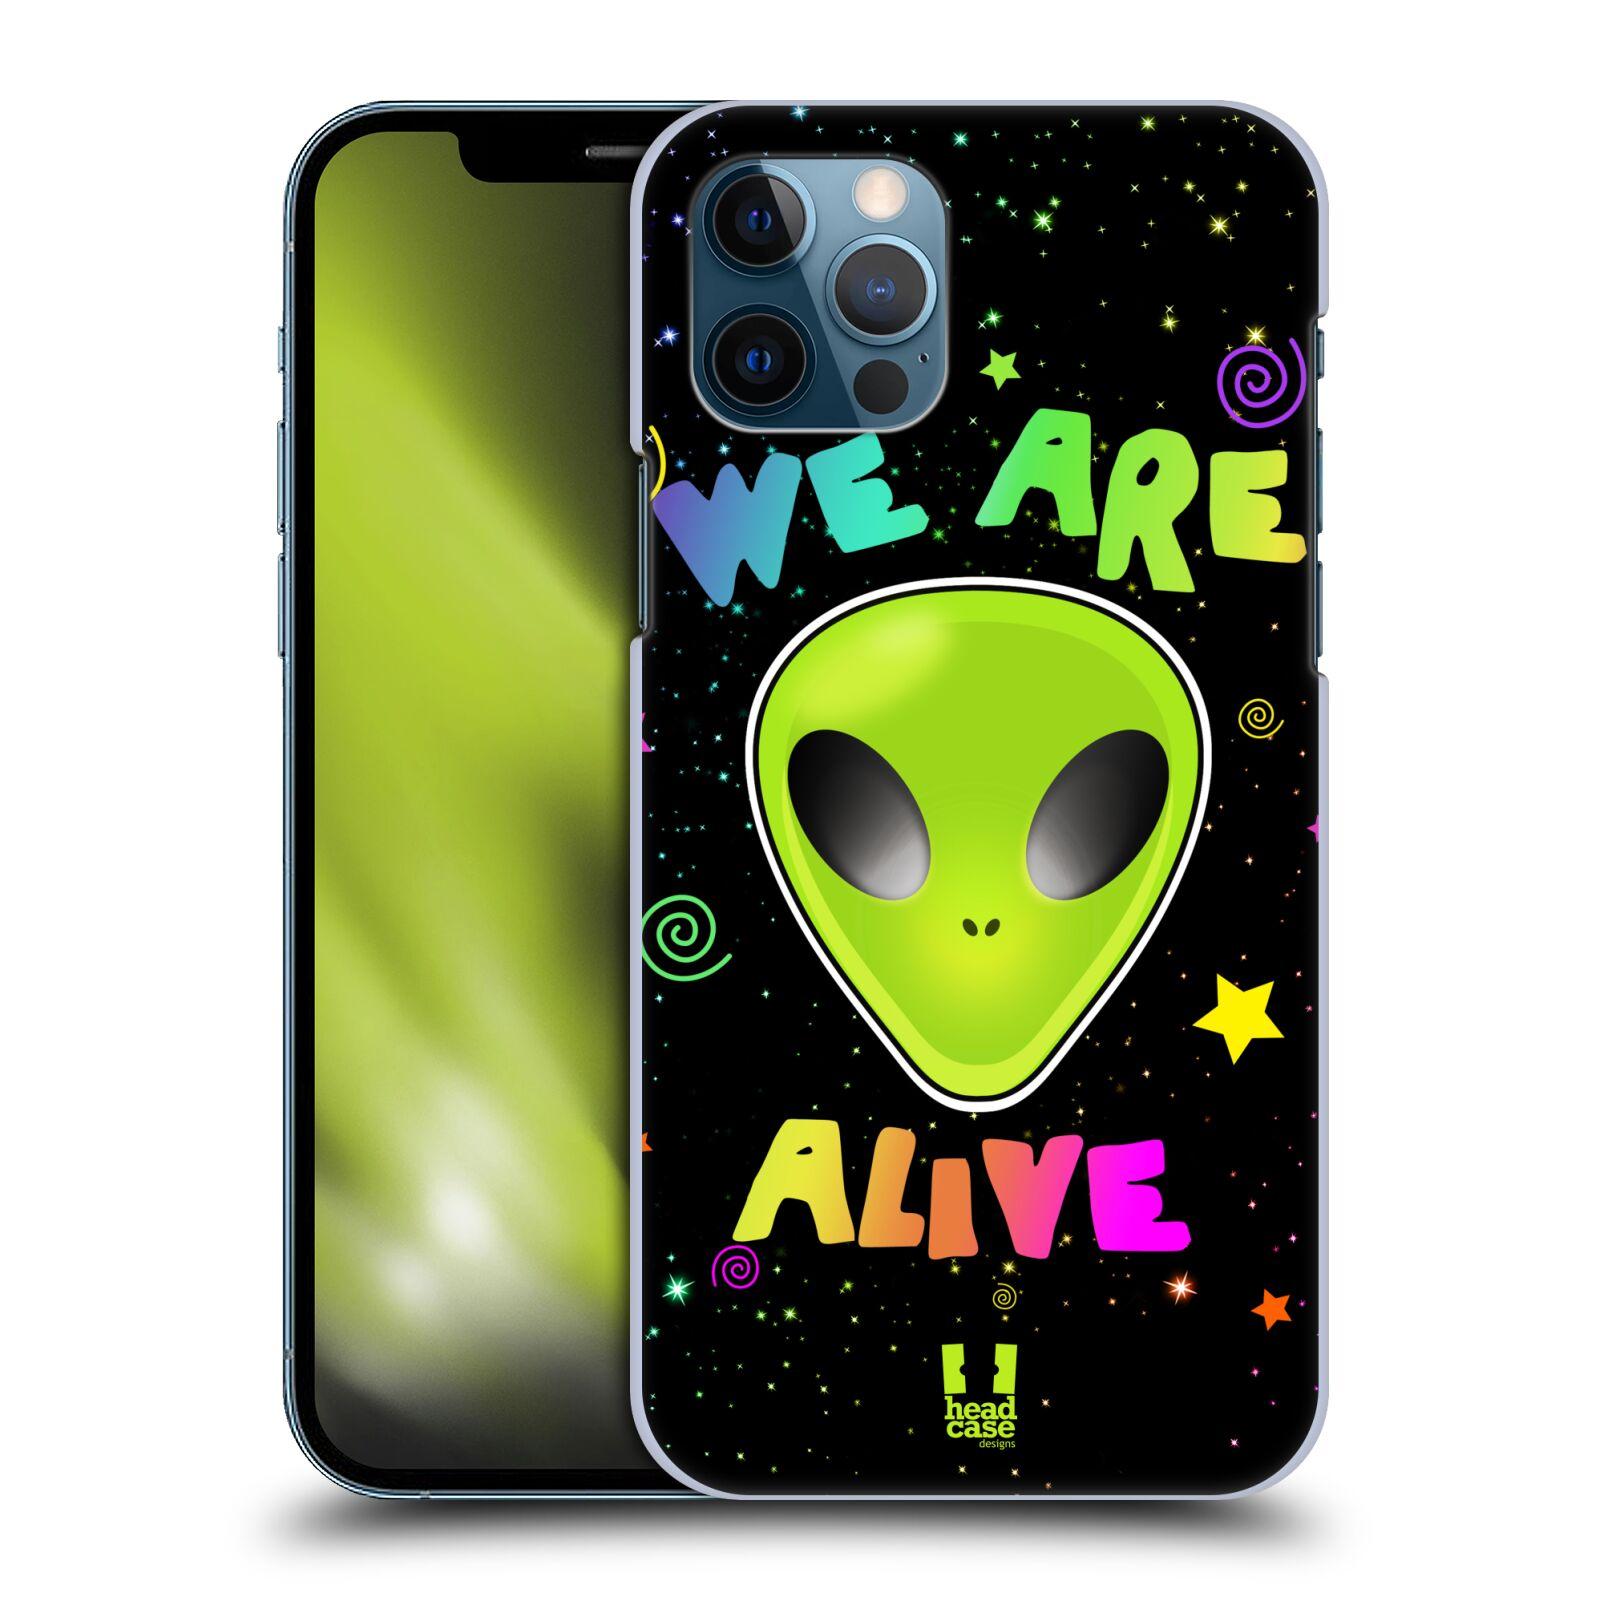 Plastové pouzdro na mobil Apple iPhone 12 / 12 Pro - Head Case - ALIENS ALIVE